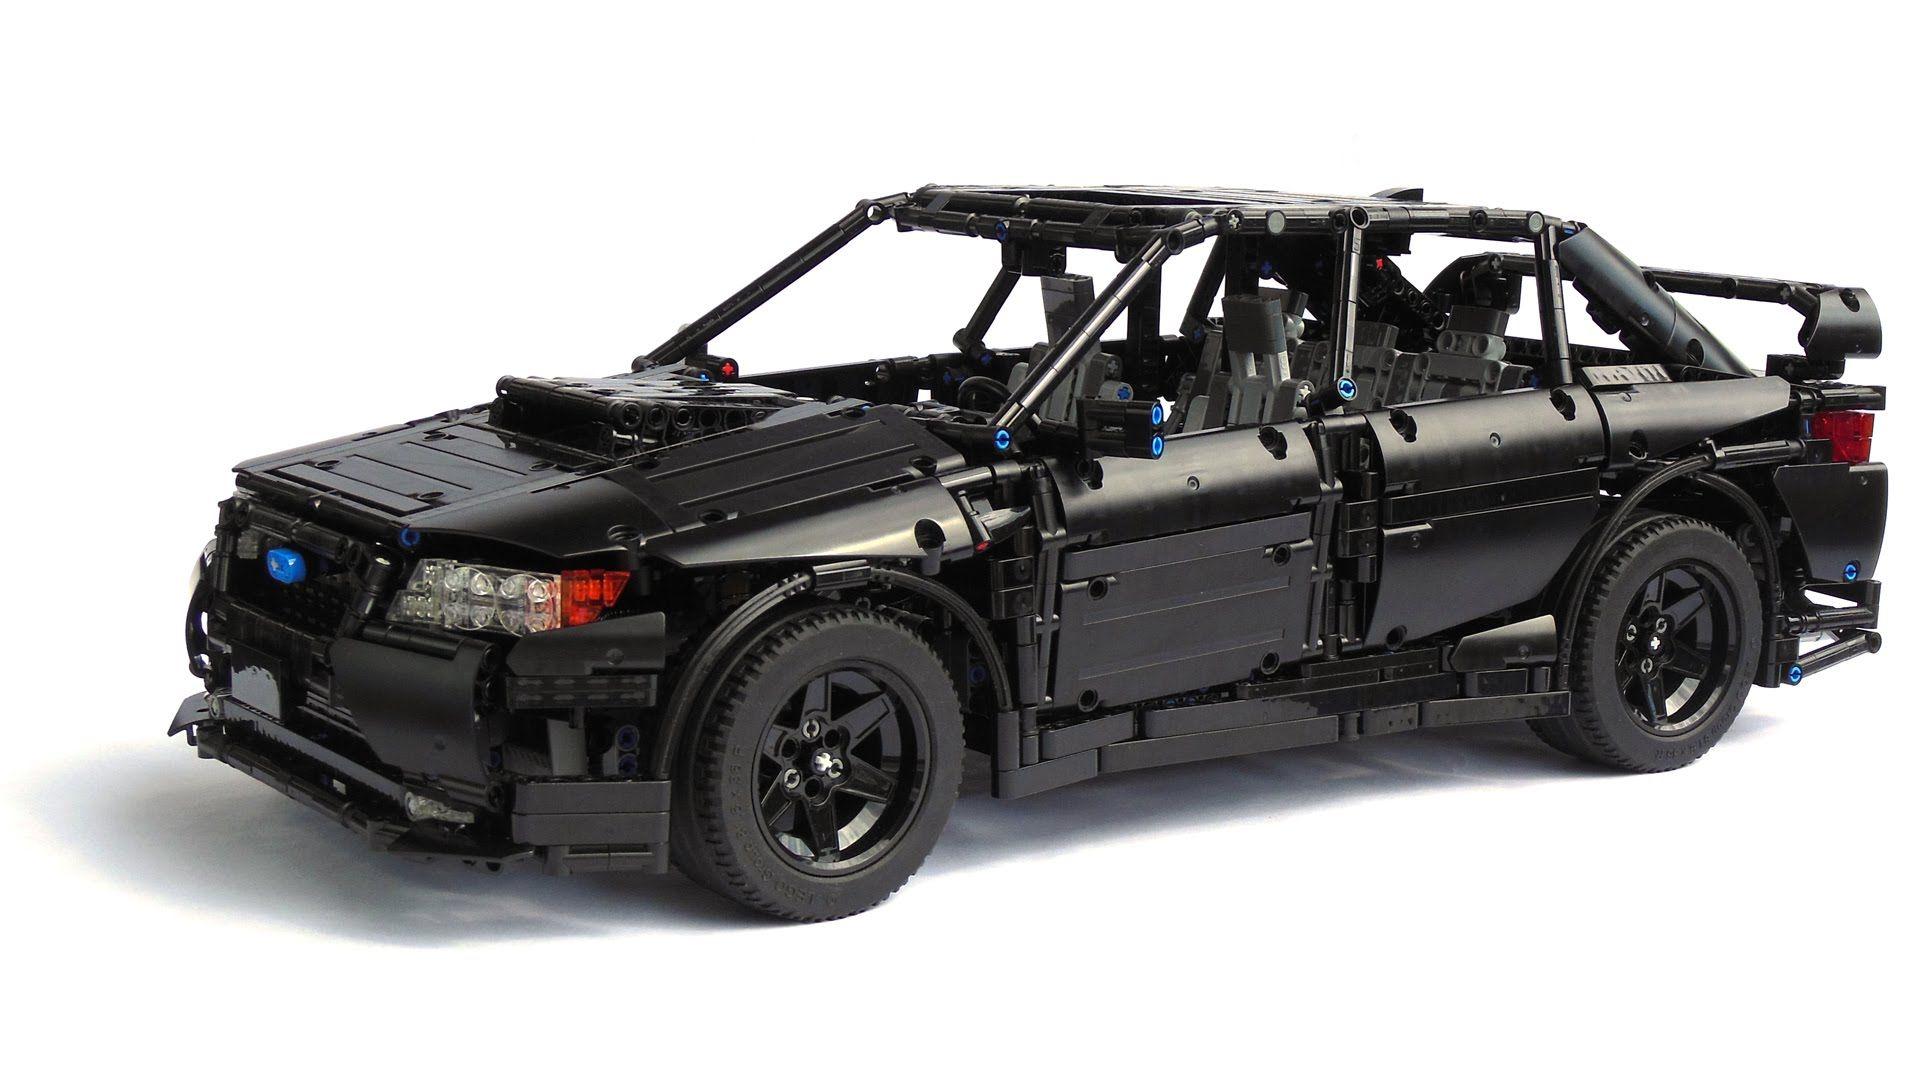 lego technic subaru impreza wrx sti lego technic modelle. Black Bedroom Furniture Sets. Home Design Ideas